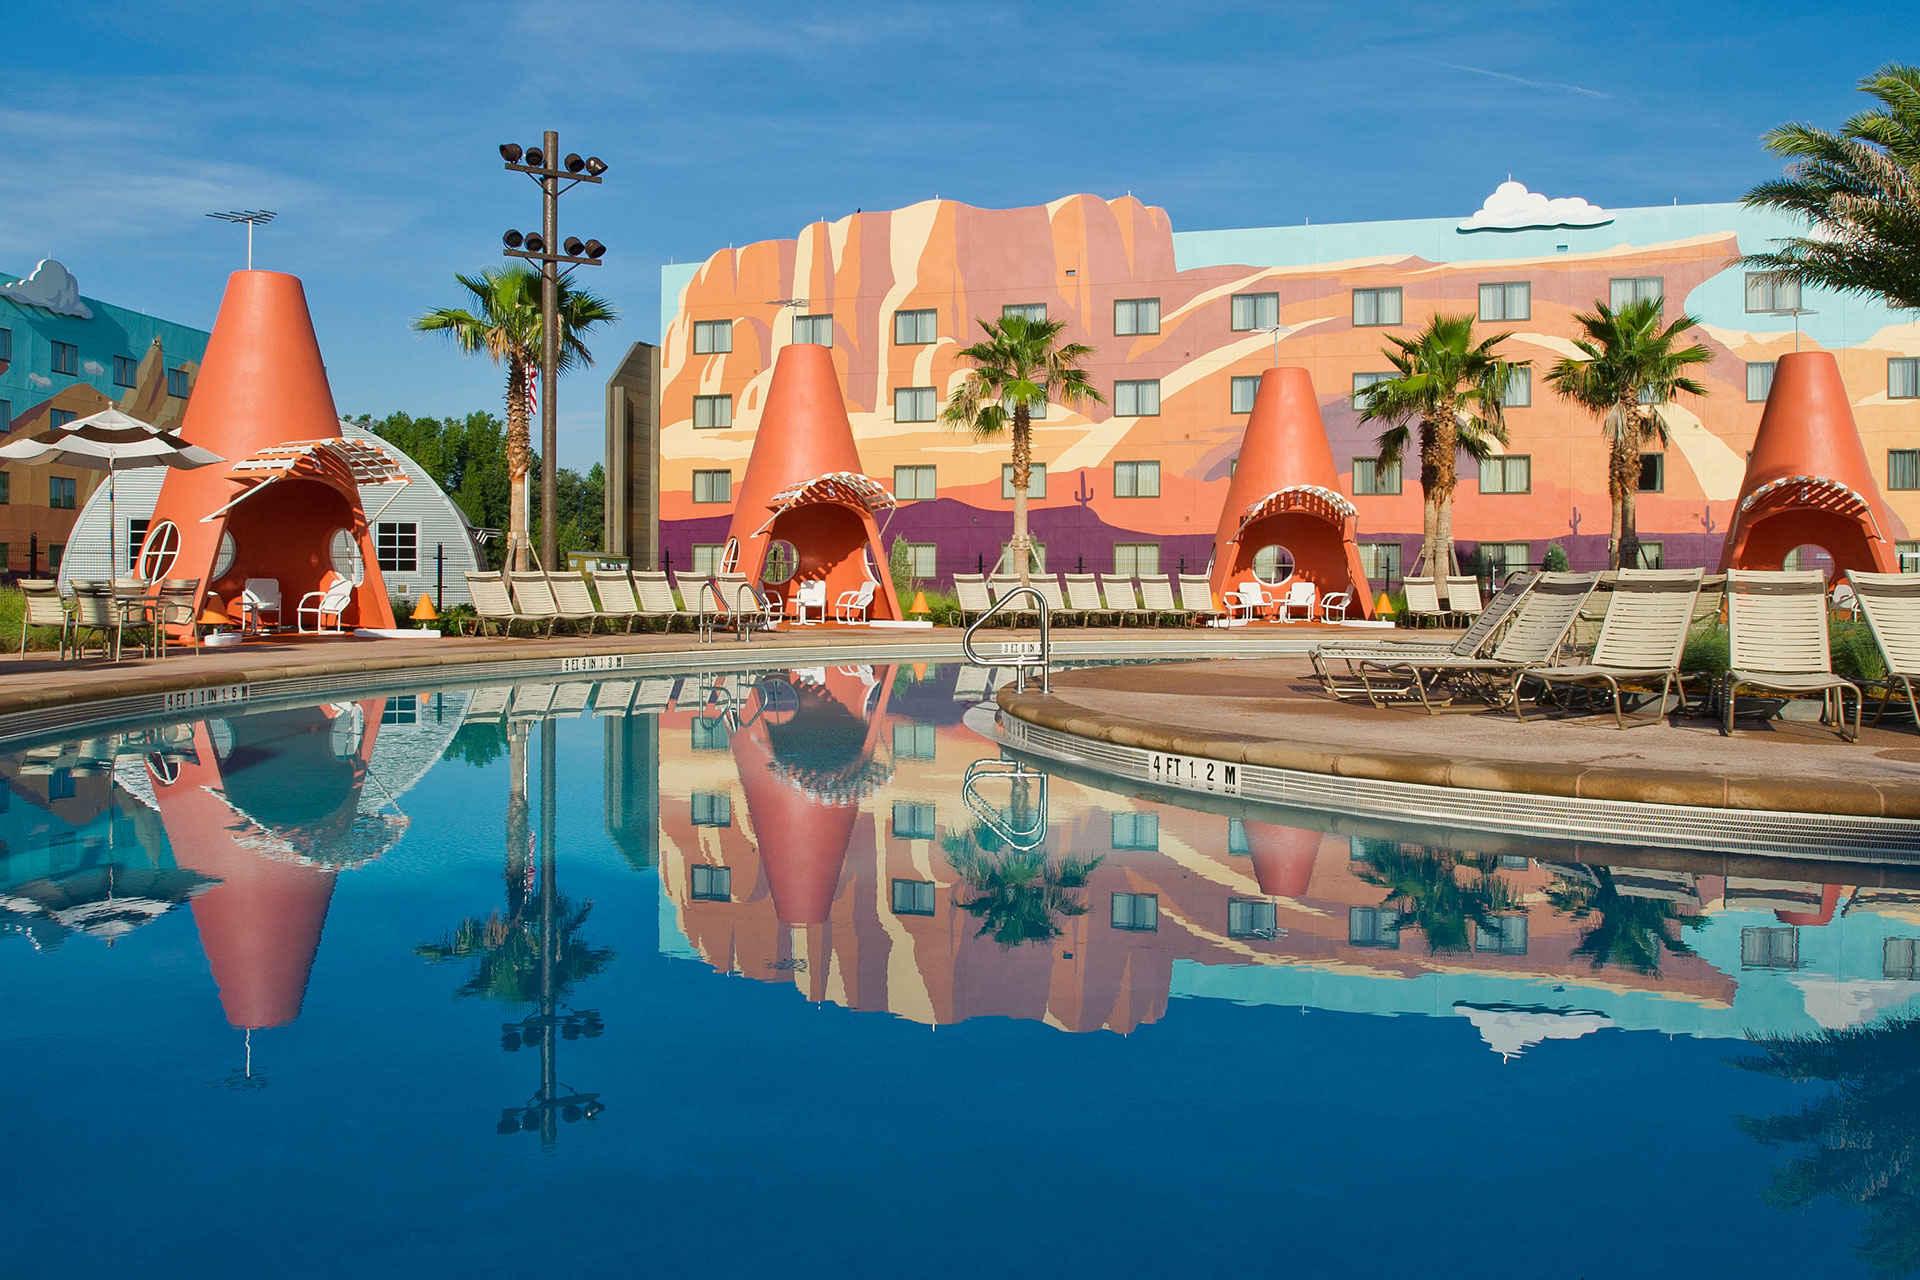 Pool at Disney's Pop Century Resort